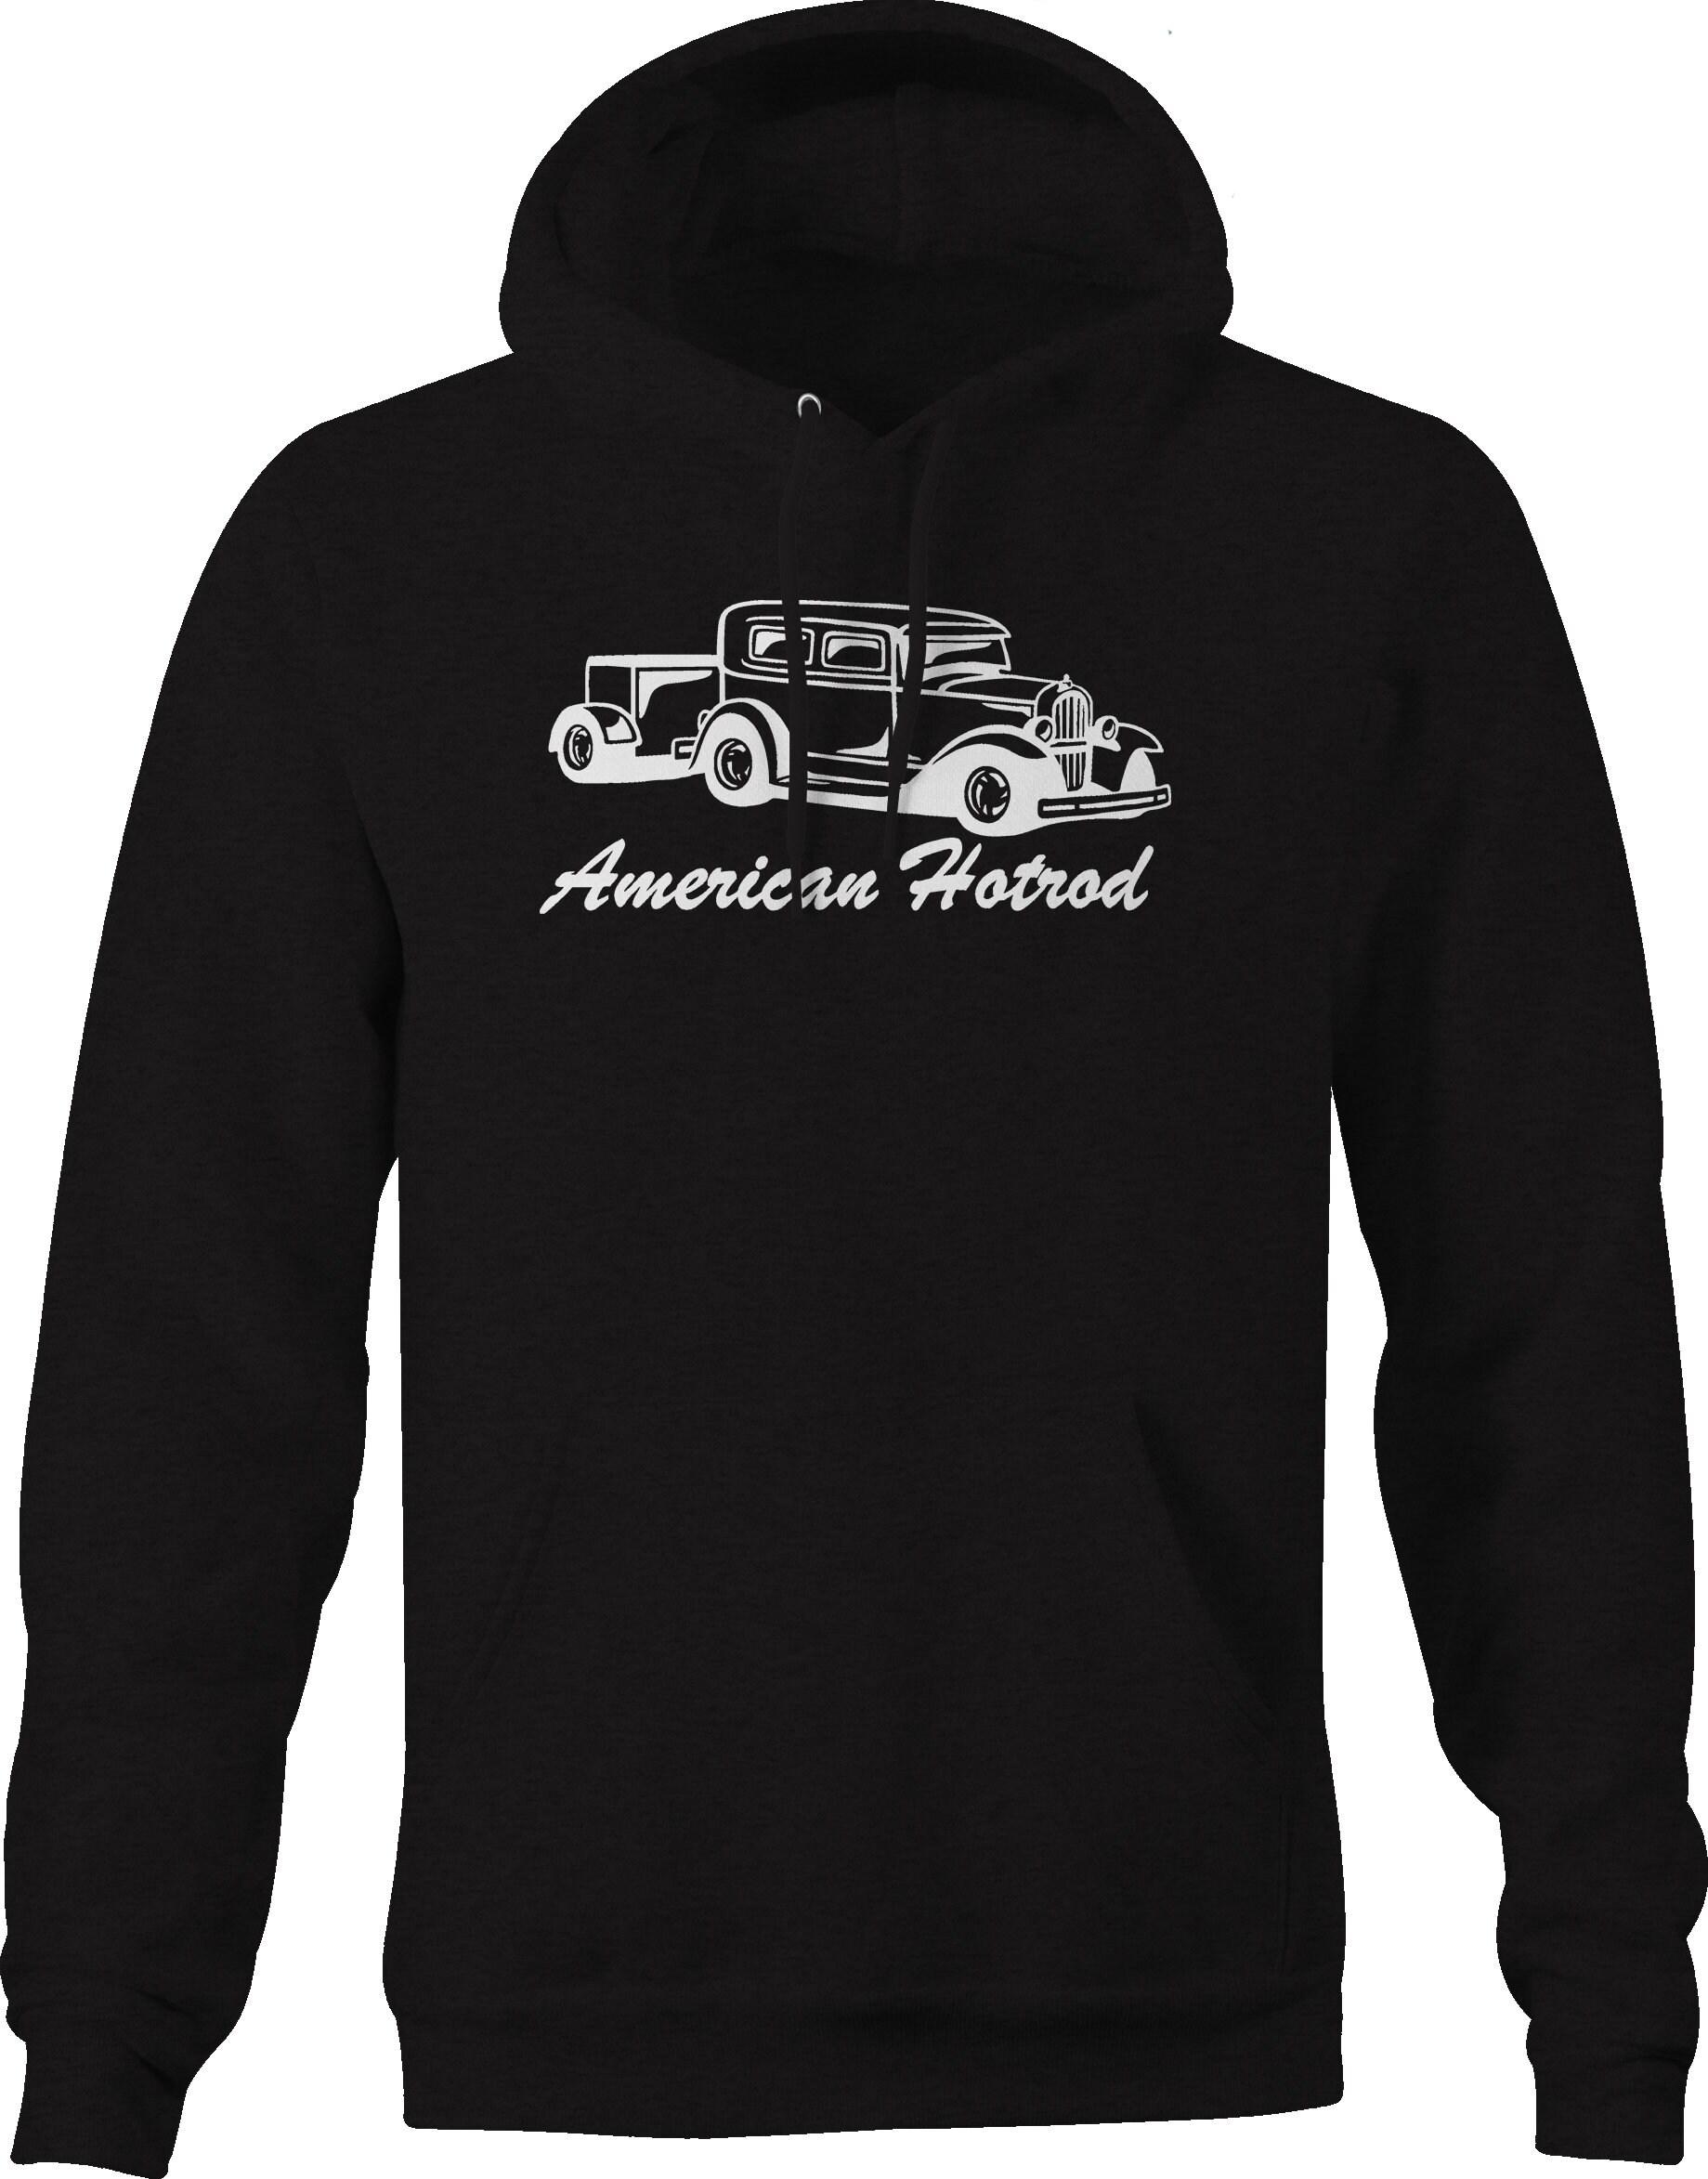 American Classic Hotrod Saloon berline avec remorque Sweatshirt à à Sweatshirt capuche 729104